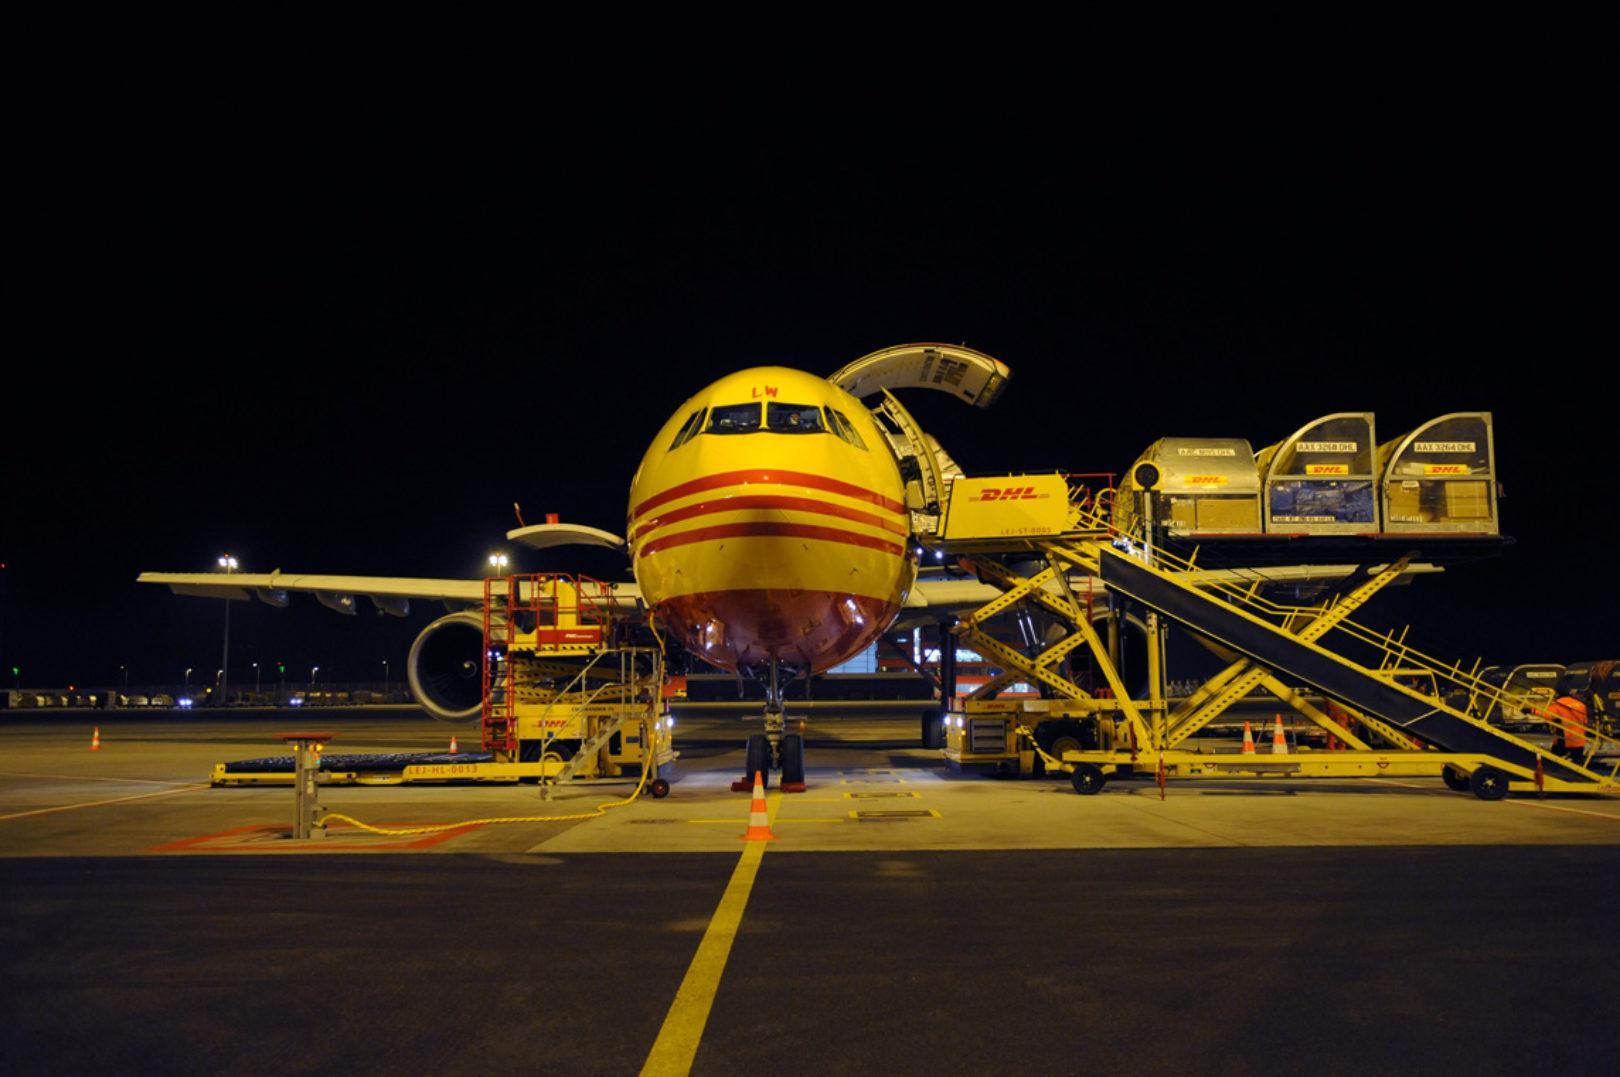 Leipzig/Halle Hub – unloading DHL plane, front view